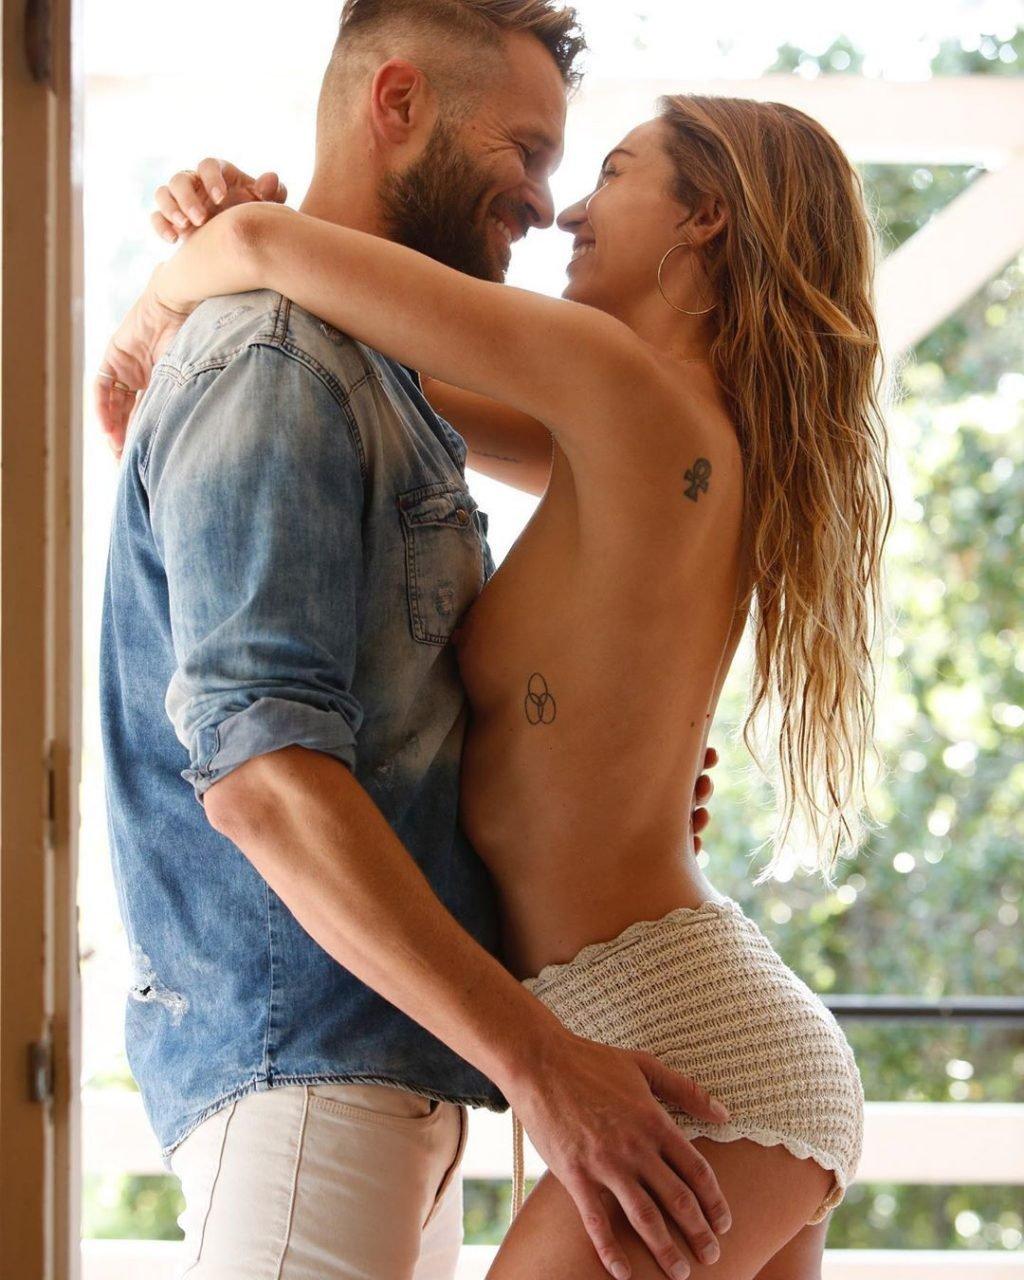 Rachel Pringle Urb Nude (11 Photos)